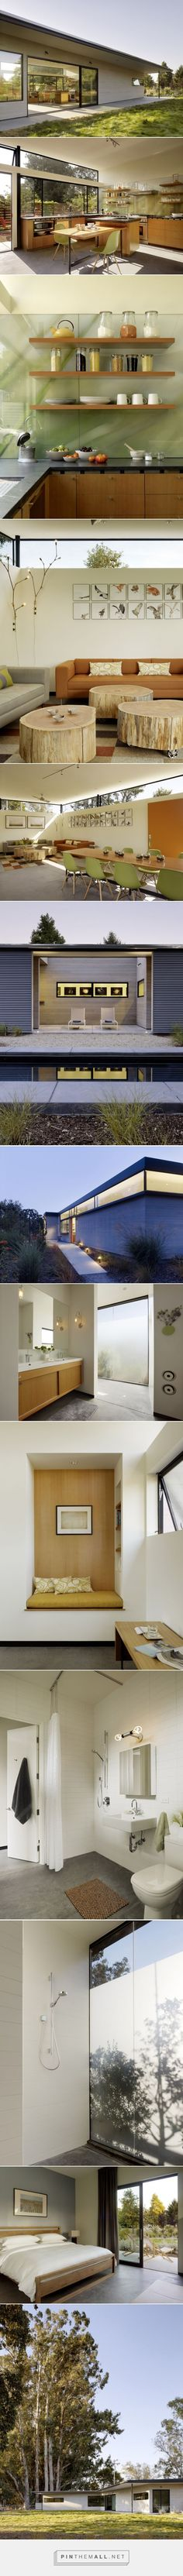 Casa barata com pinta de cara - Casa Vogue | Casas - created via https://pinthemall.net